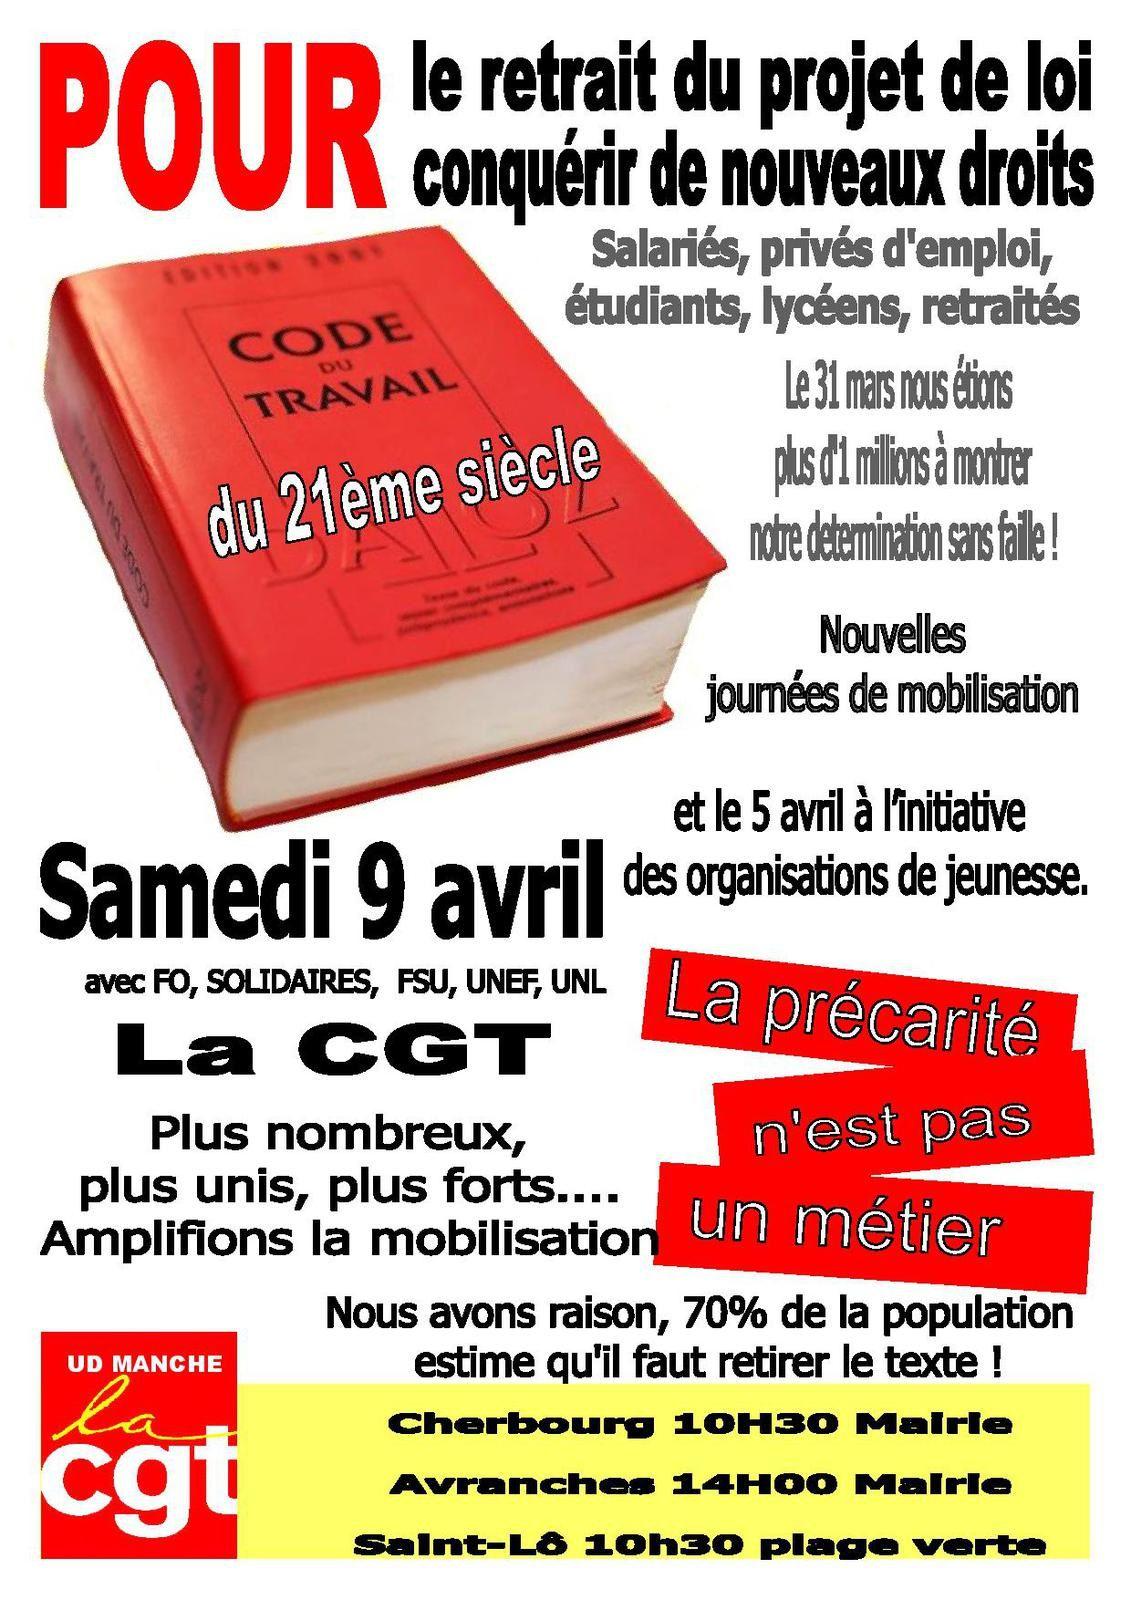 Samedi 09 avril : rassemblement à la plage verte à Saint-Lô à 10 h 30